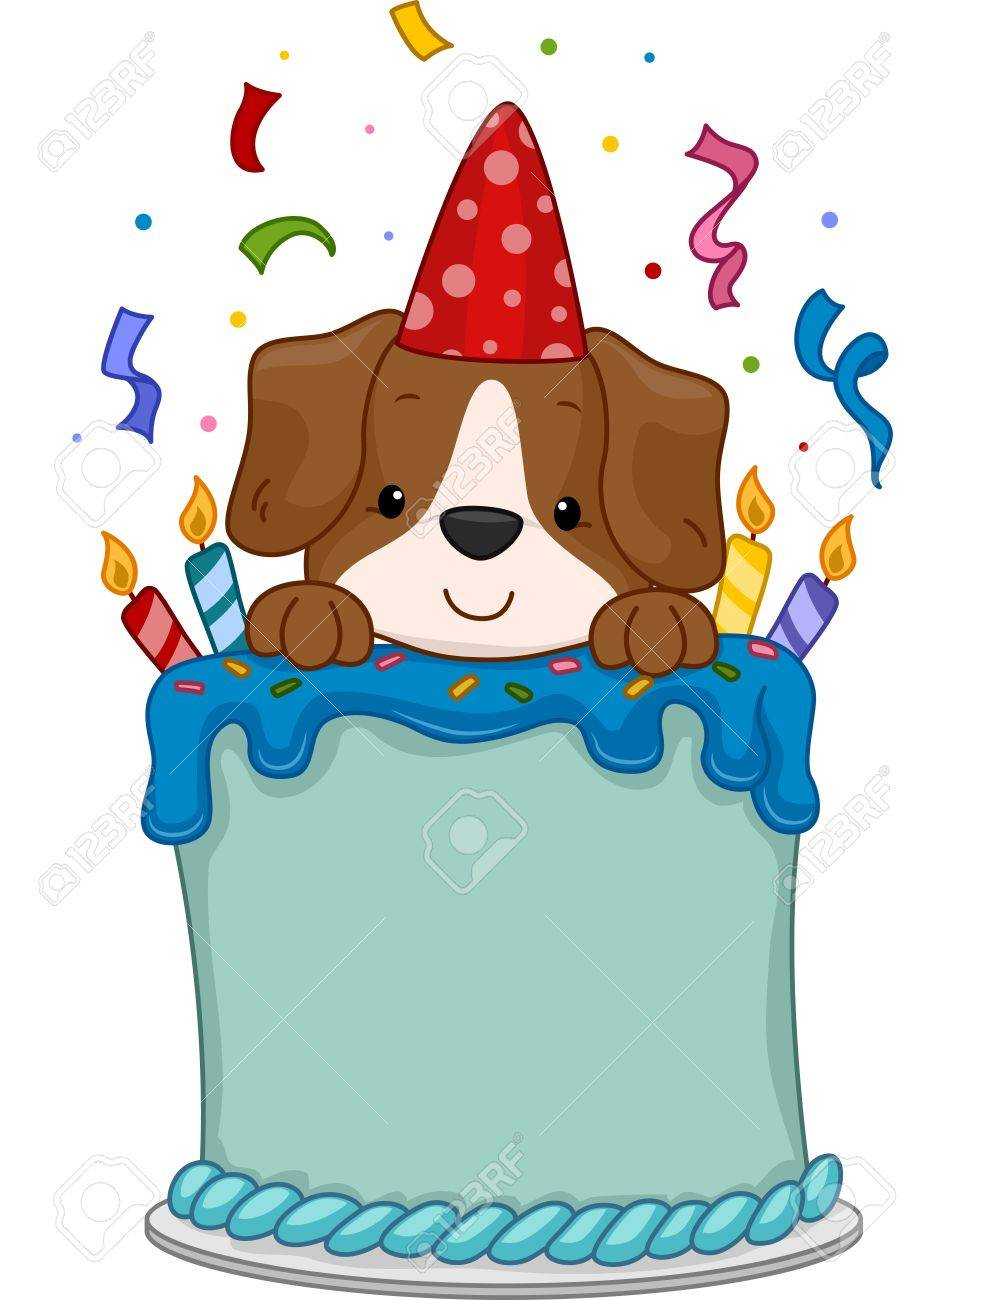 Illustration Of A Cute Dog Sitting On A Birthday Cake Royalty Free